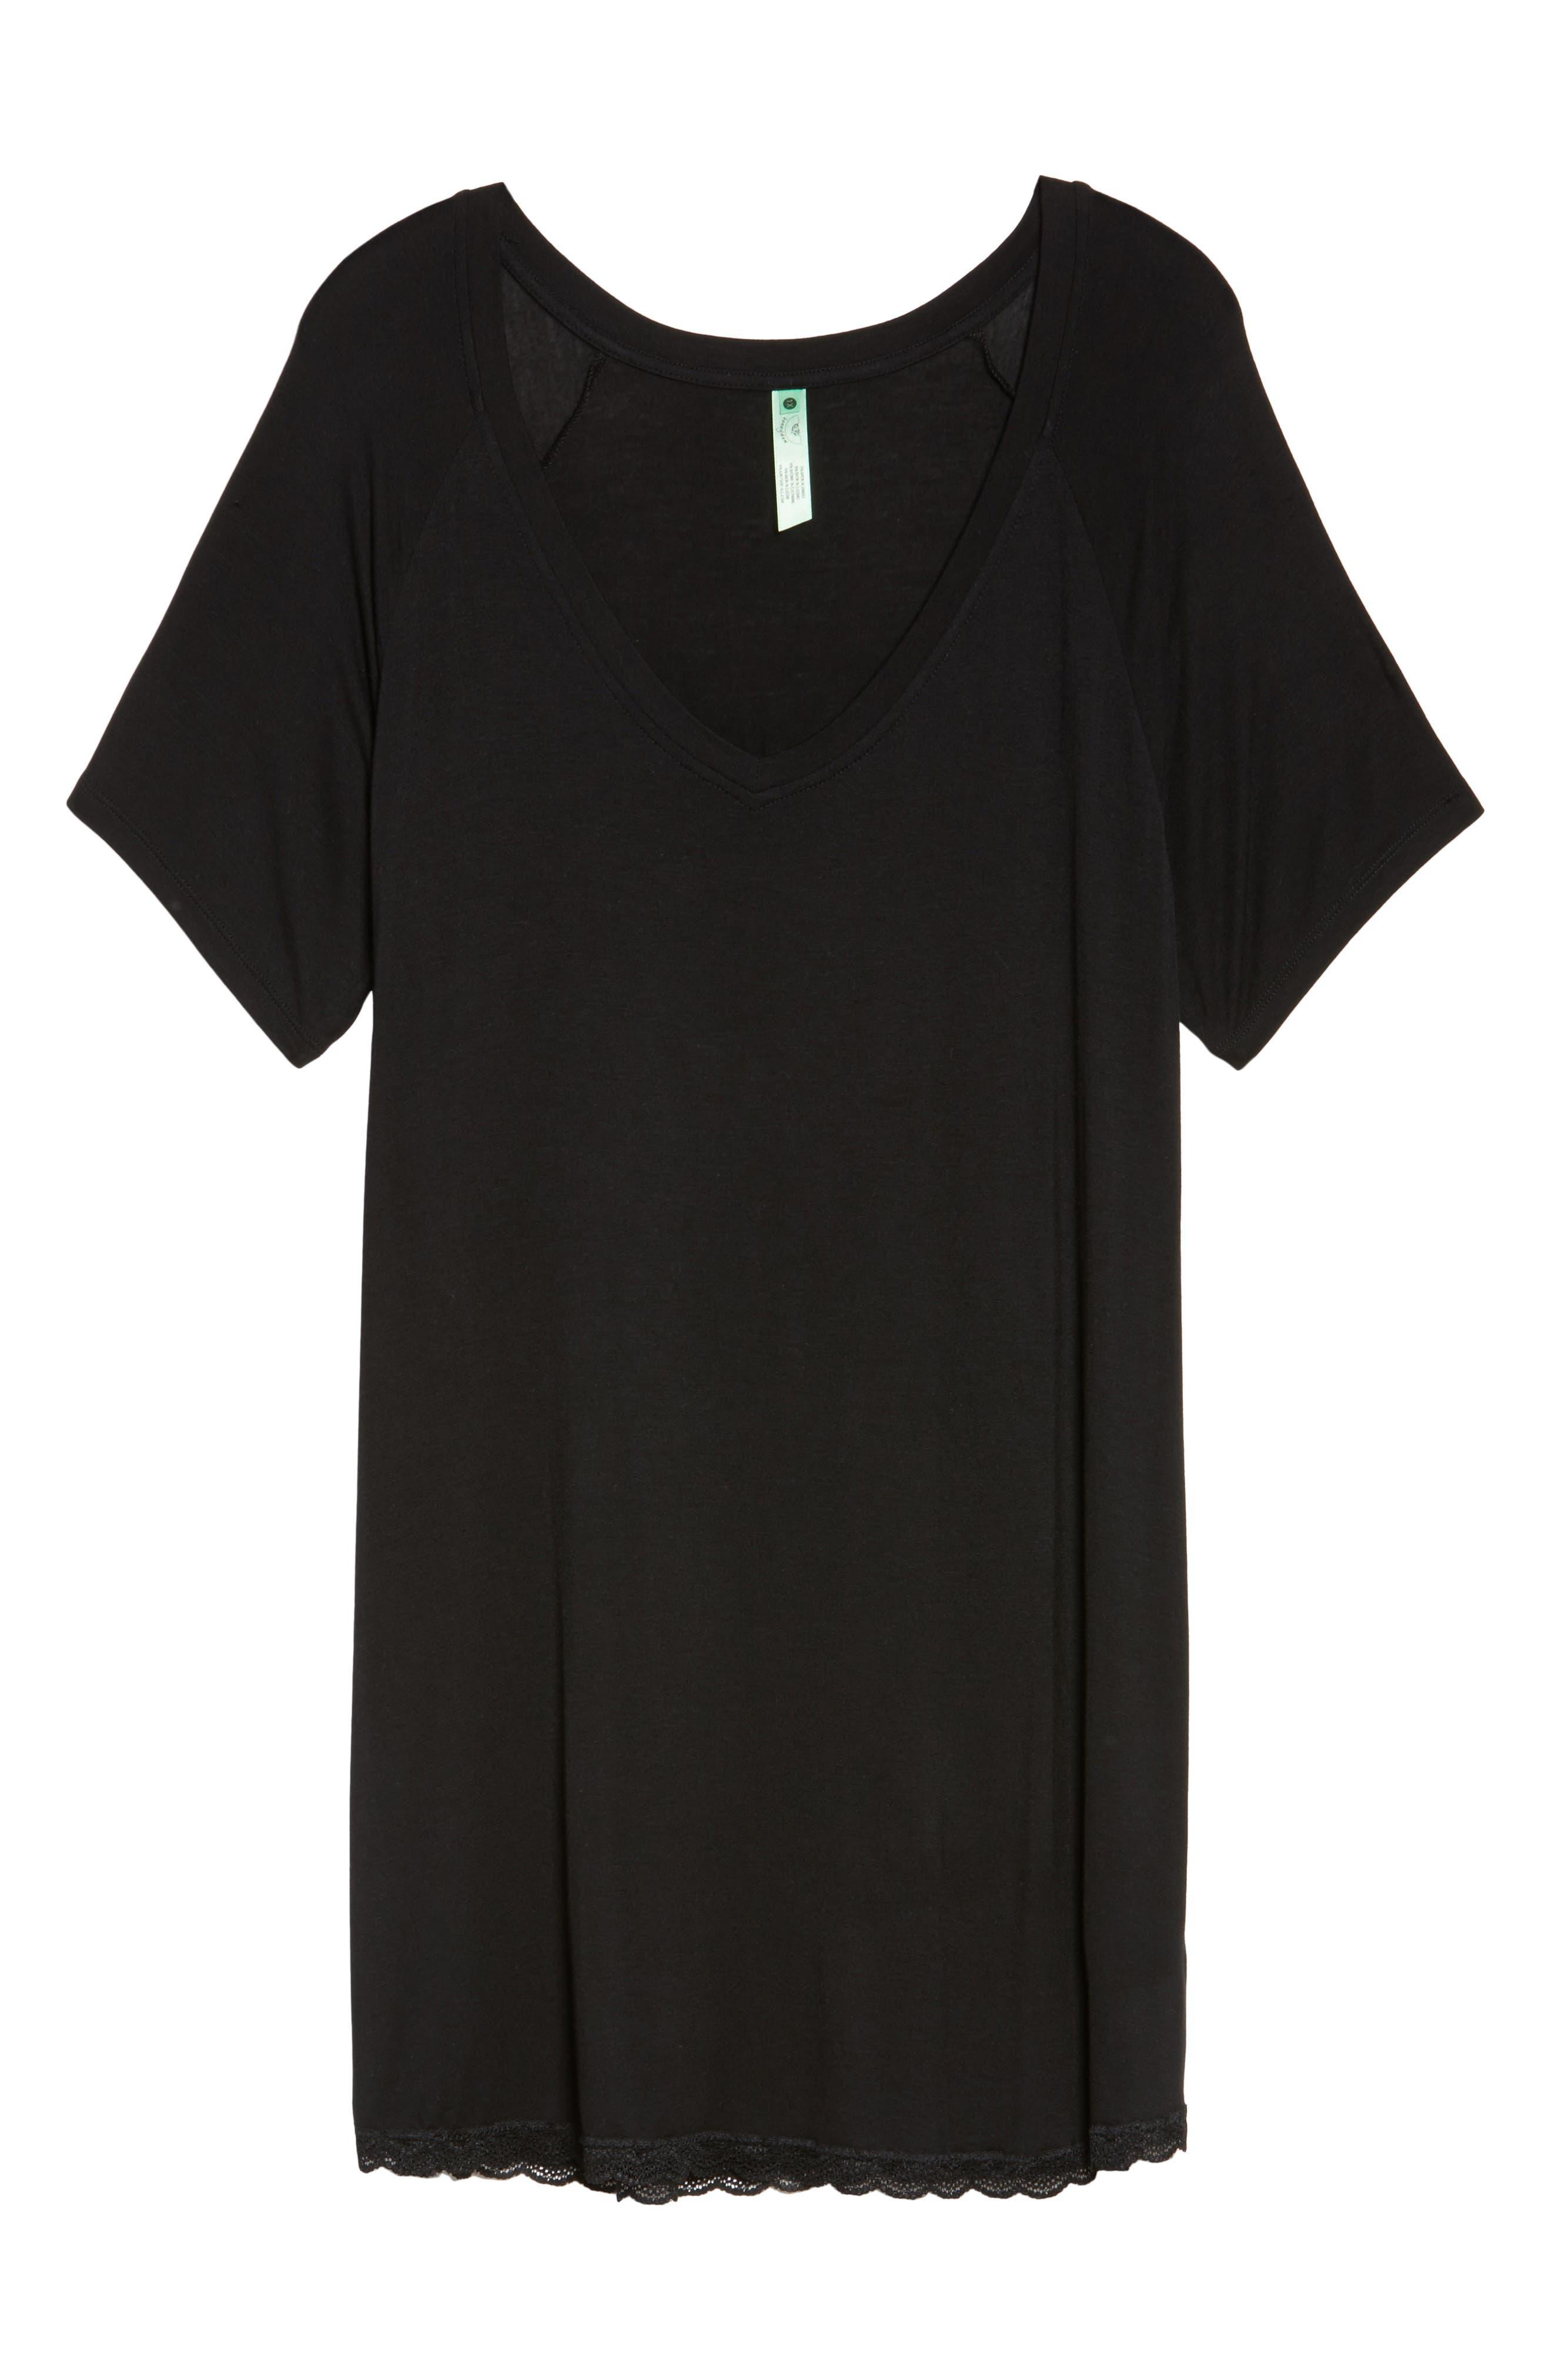 All American Sleep Shirt,                             Alternate thumbnail 6, color,                             BLACK